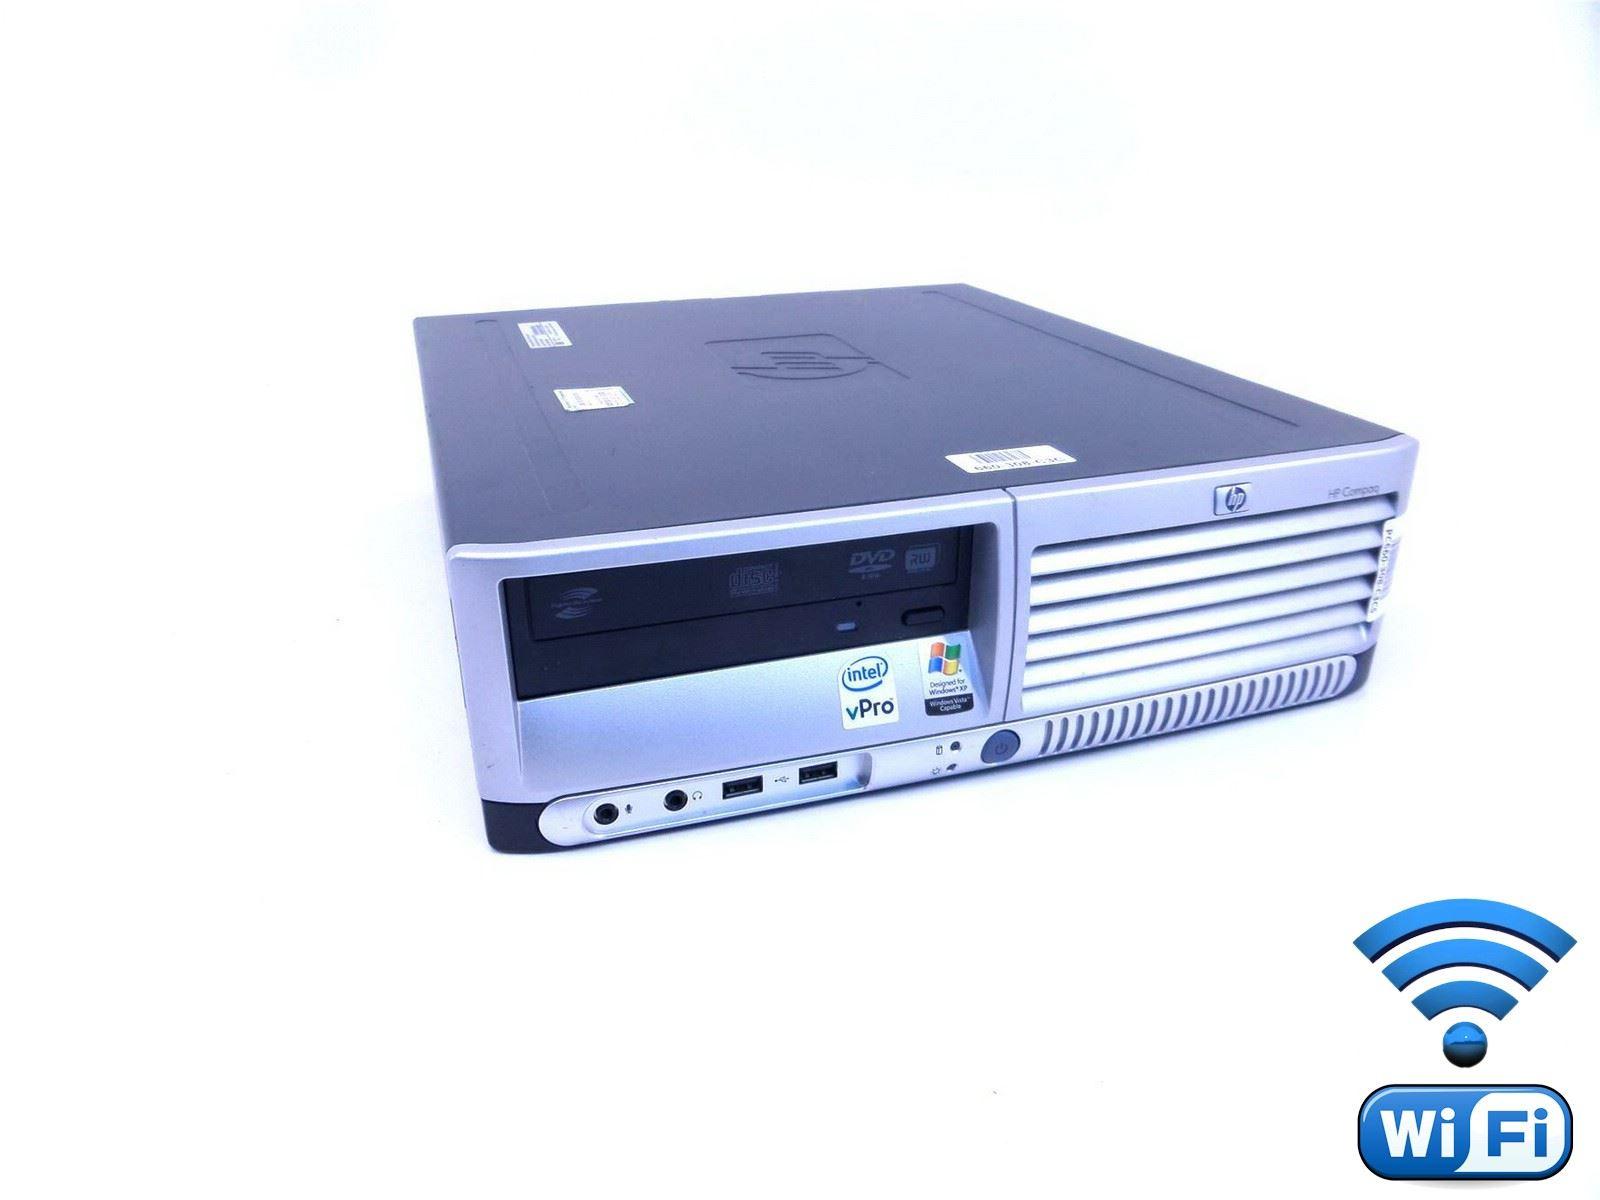 Intel 965 audio driver for windows xp bifugun's blog.